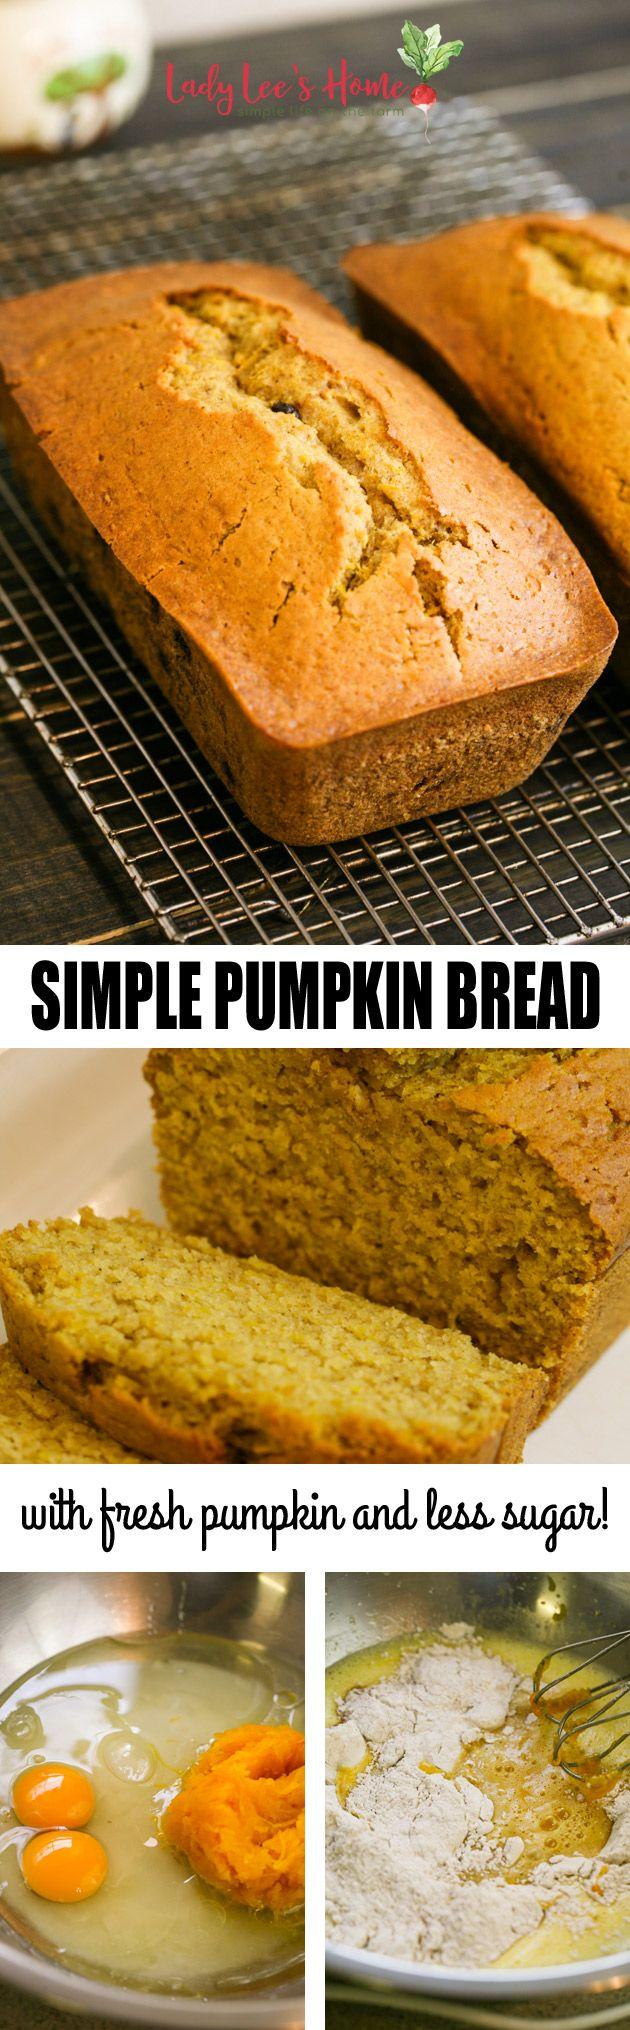 Easy Pumpkin Bread Recipe Pumpkin bread, Pumpkin